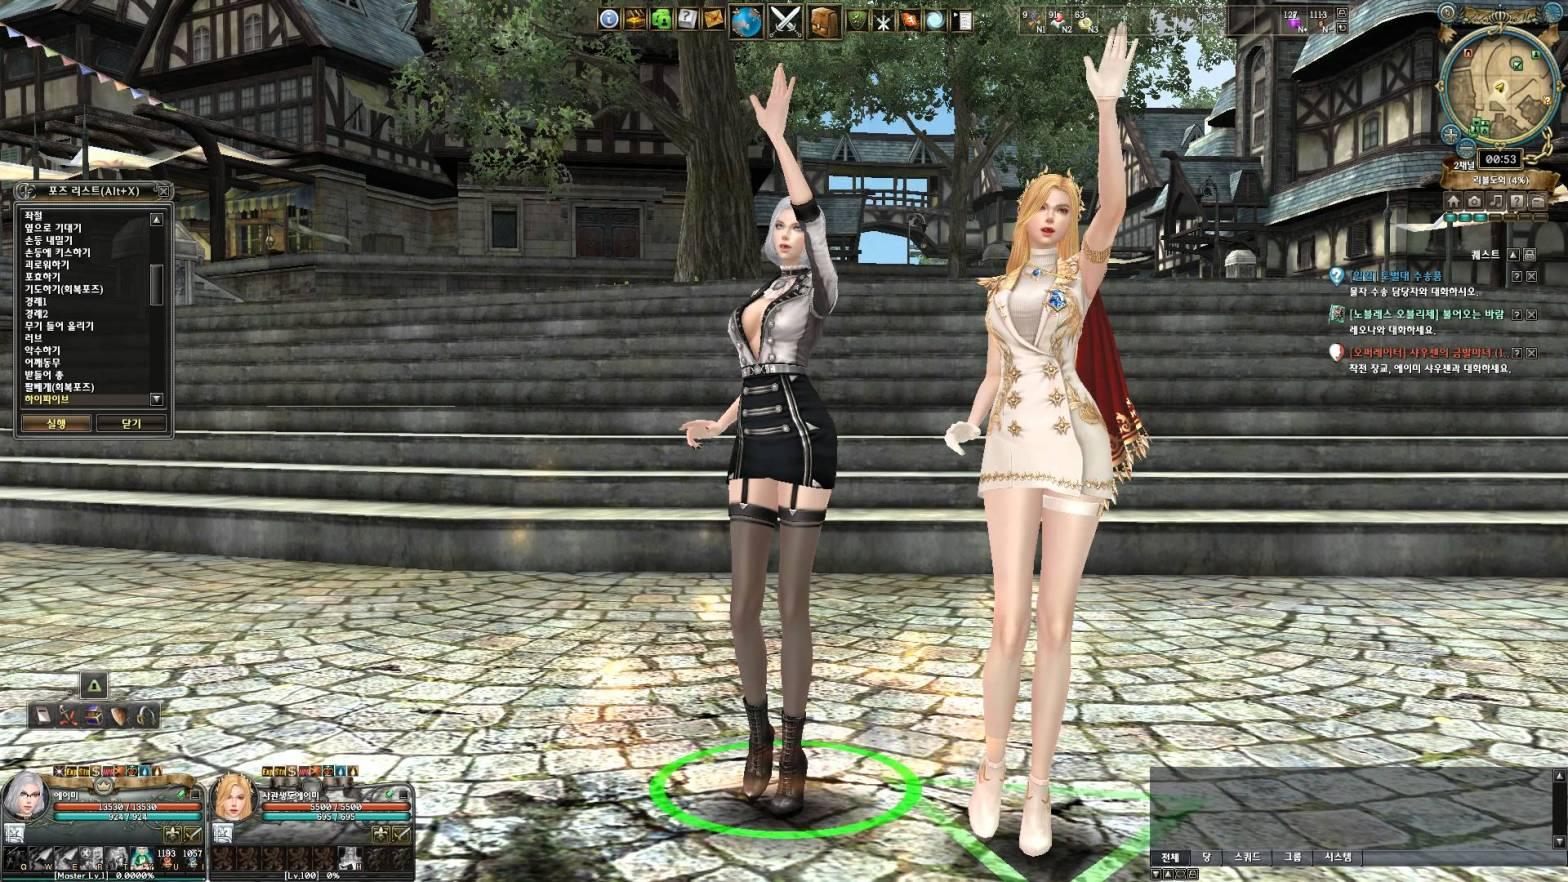 Slidewinder, Games, Online Games, Video Games